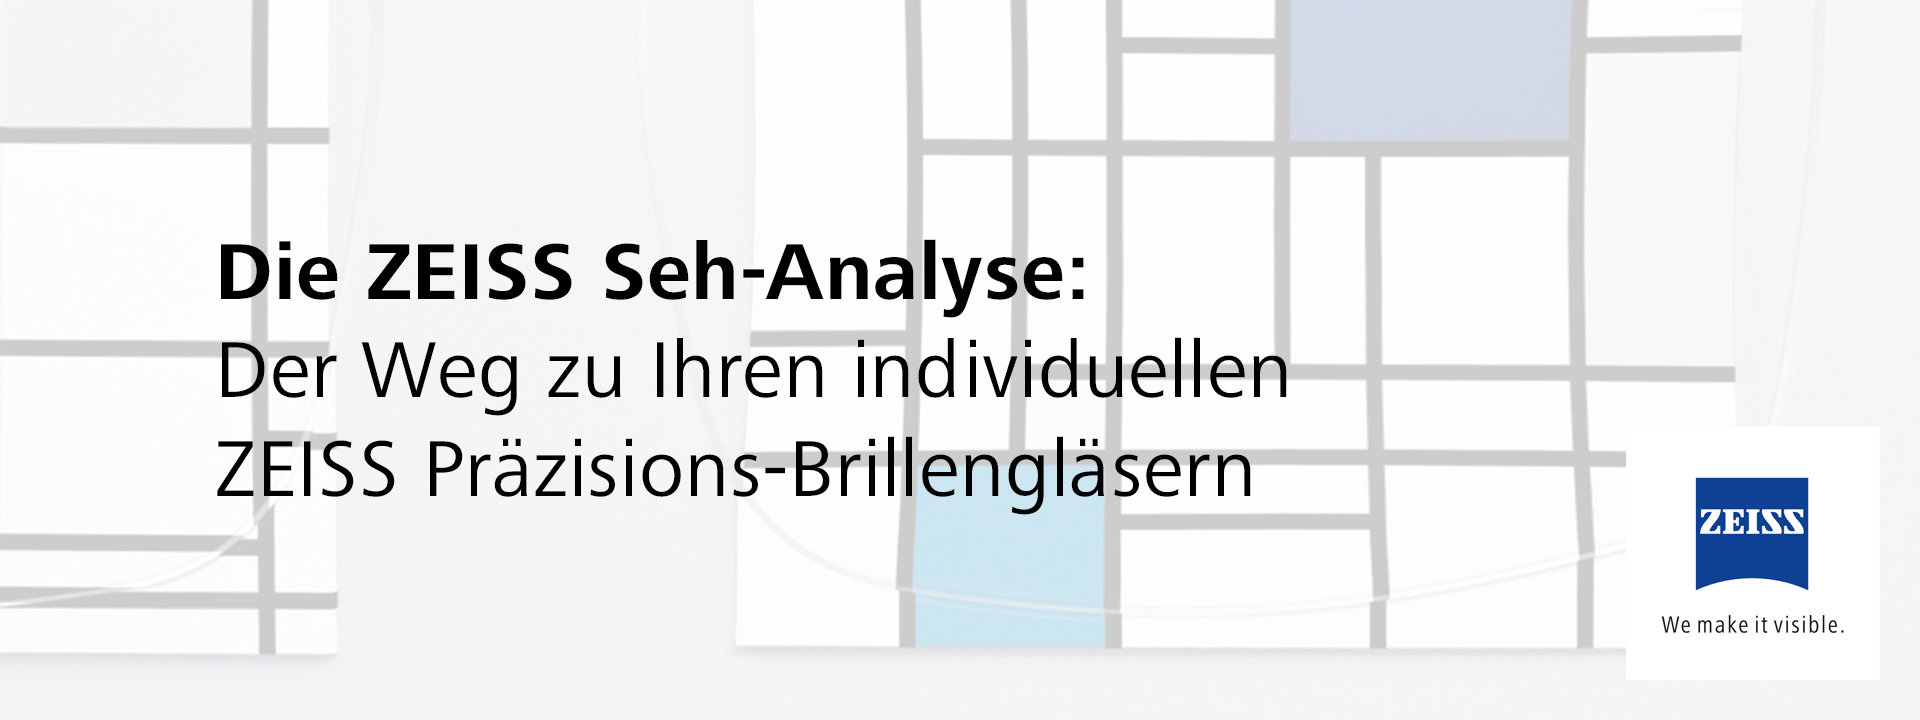 slider_seh-analyse